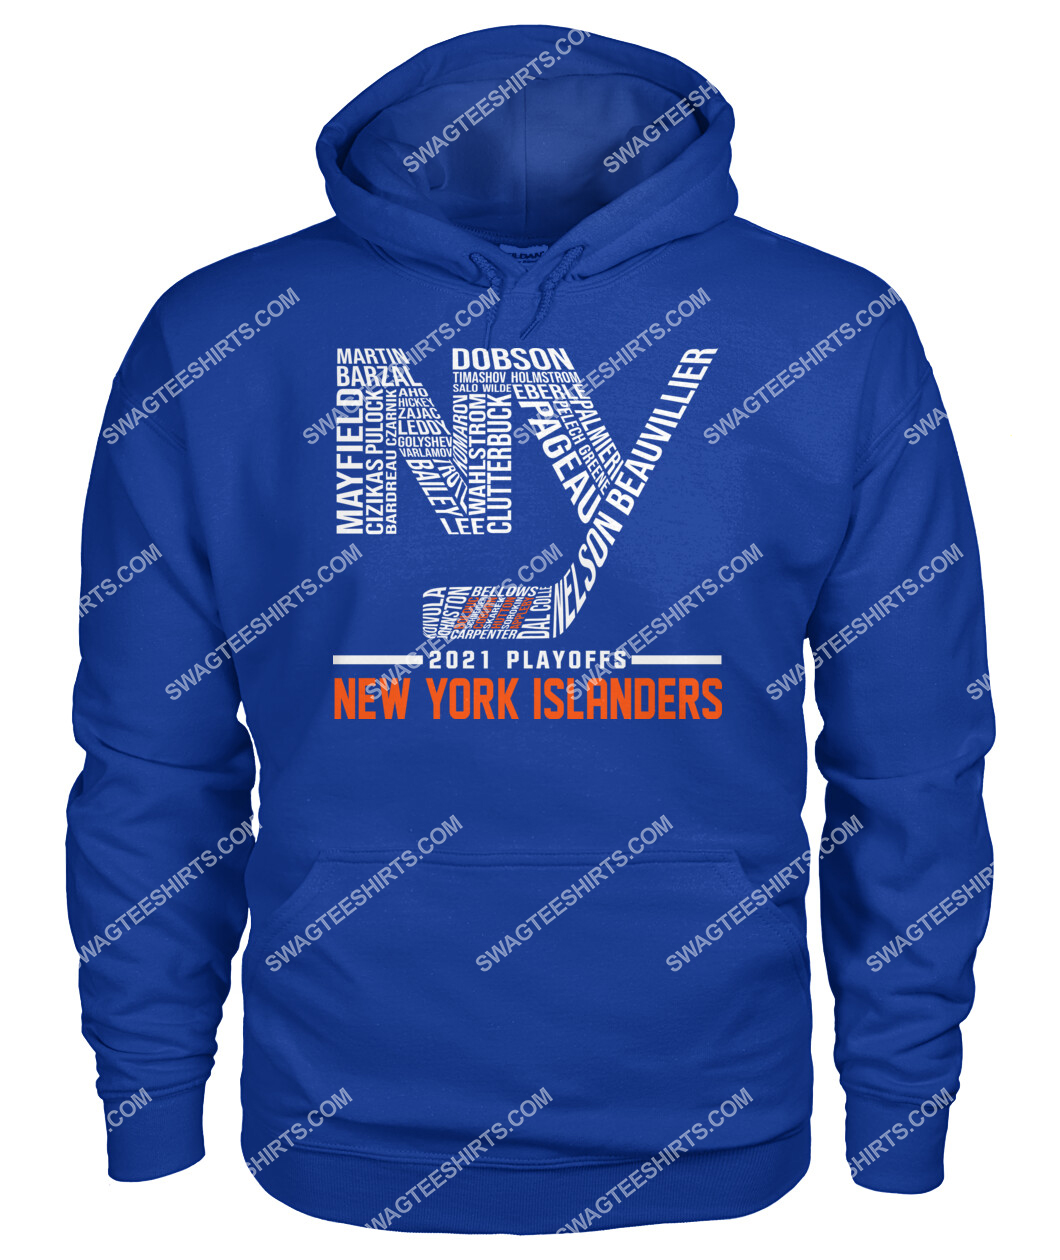 2021 playoffs new york islanders national hockey league hoodie 1